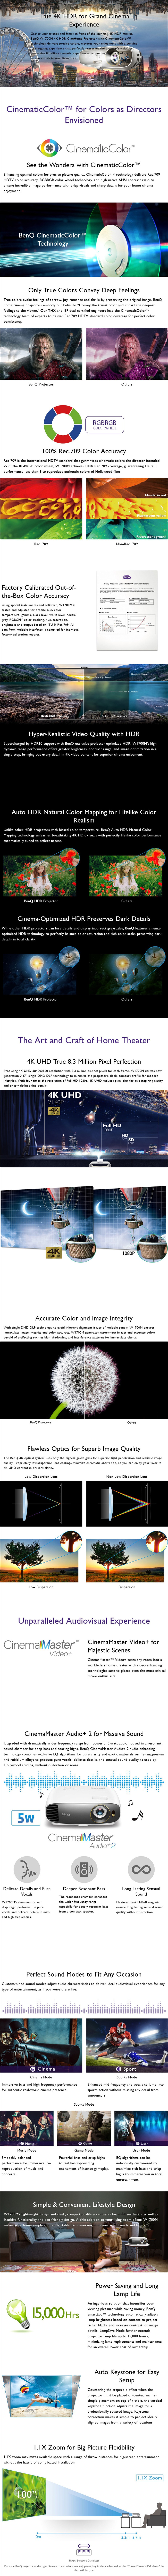 BenQ W1700M 4K UHD Home Cinema DLP Projector - Desktop Overview 1